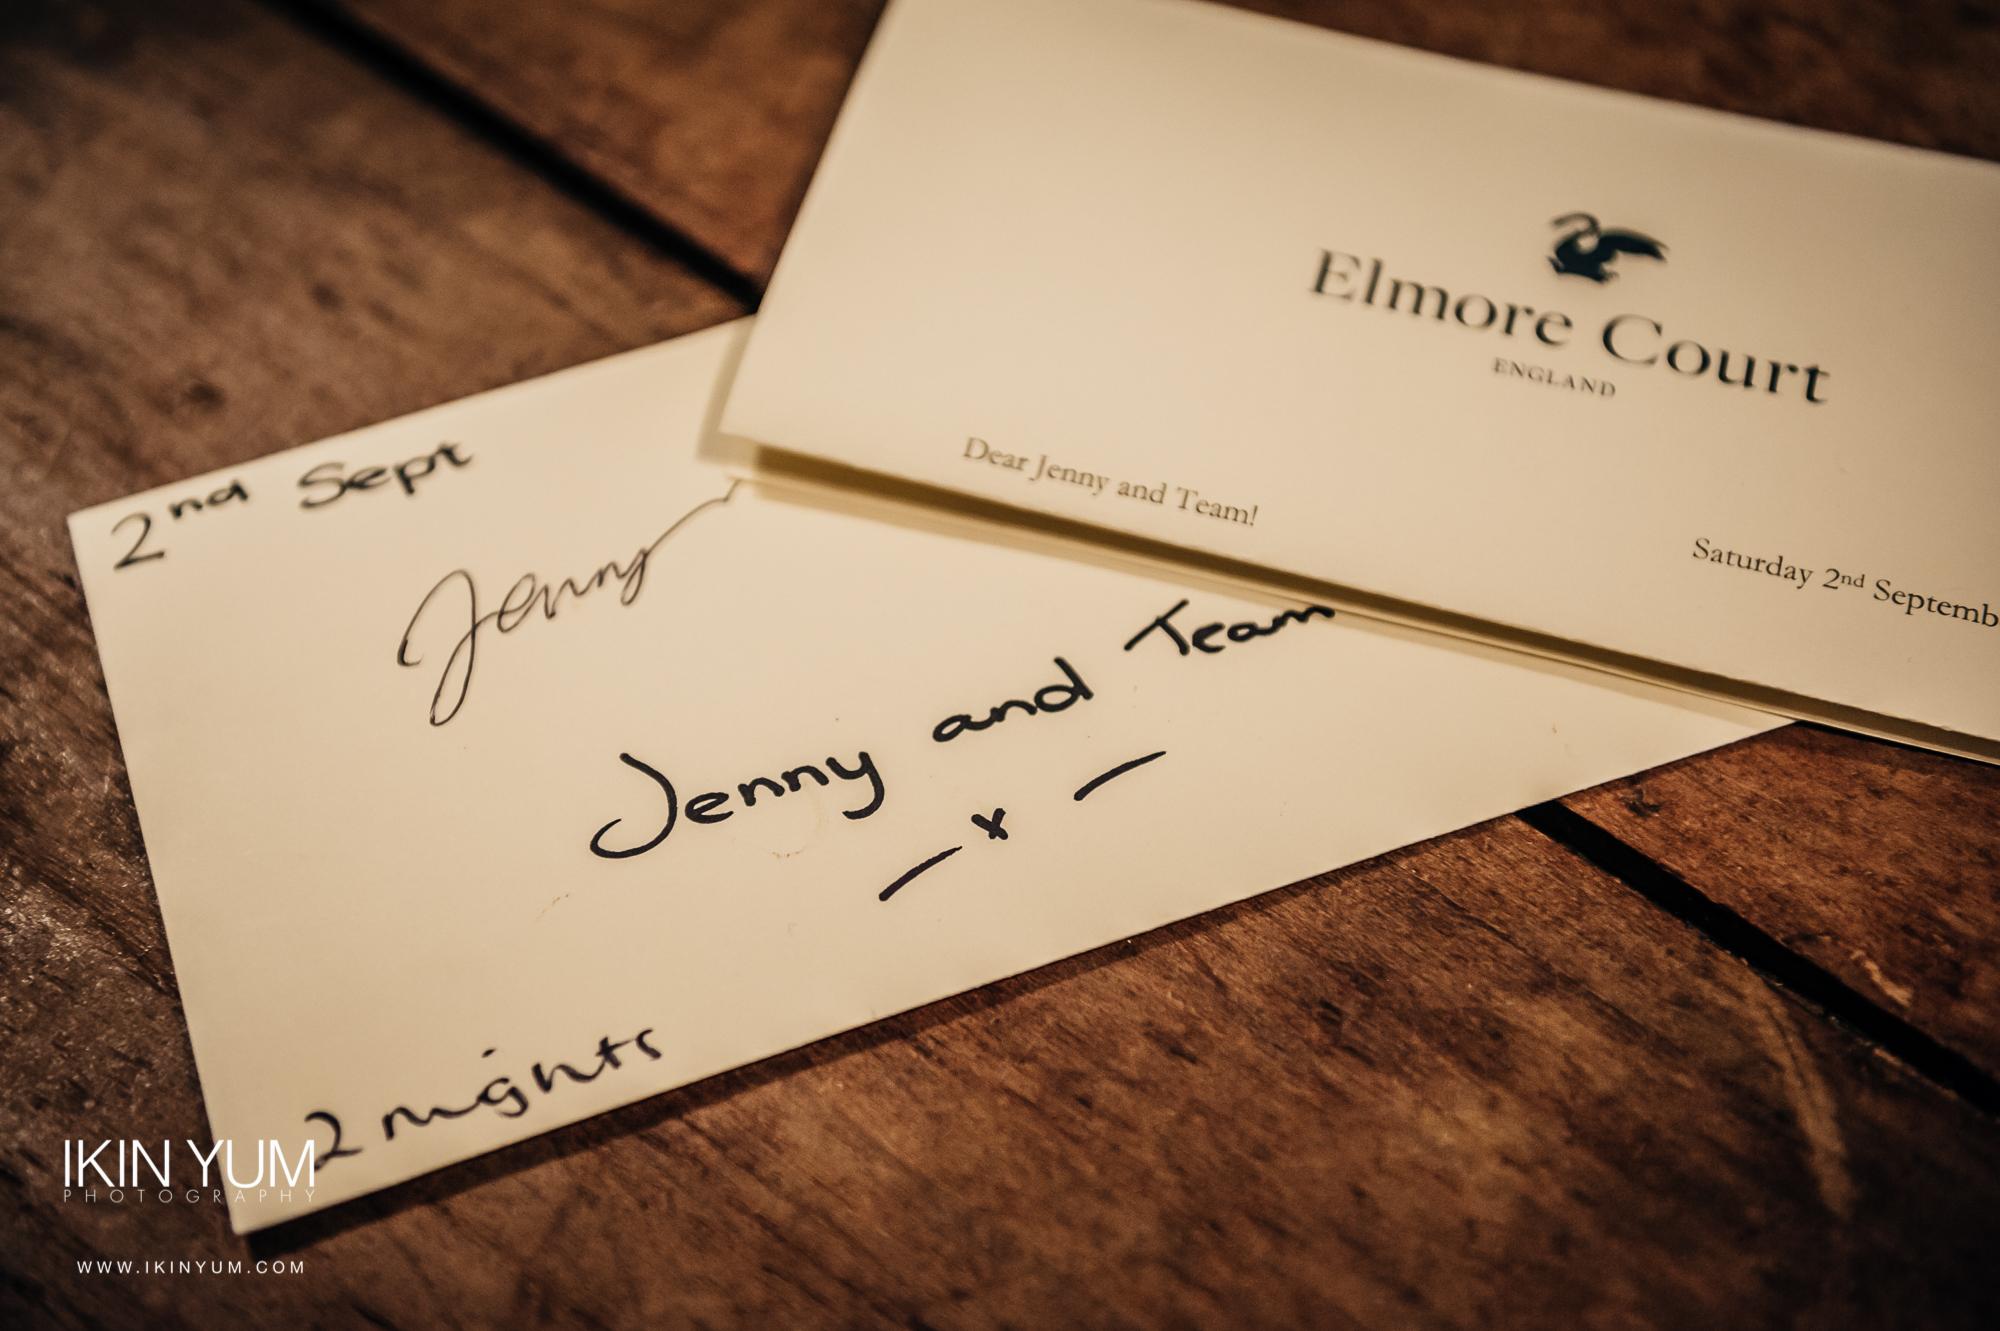 Elmore Court Wedding- Ikin Yum Photography-0003.jpg